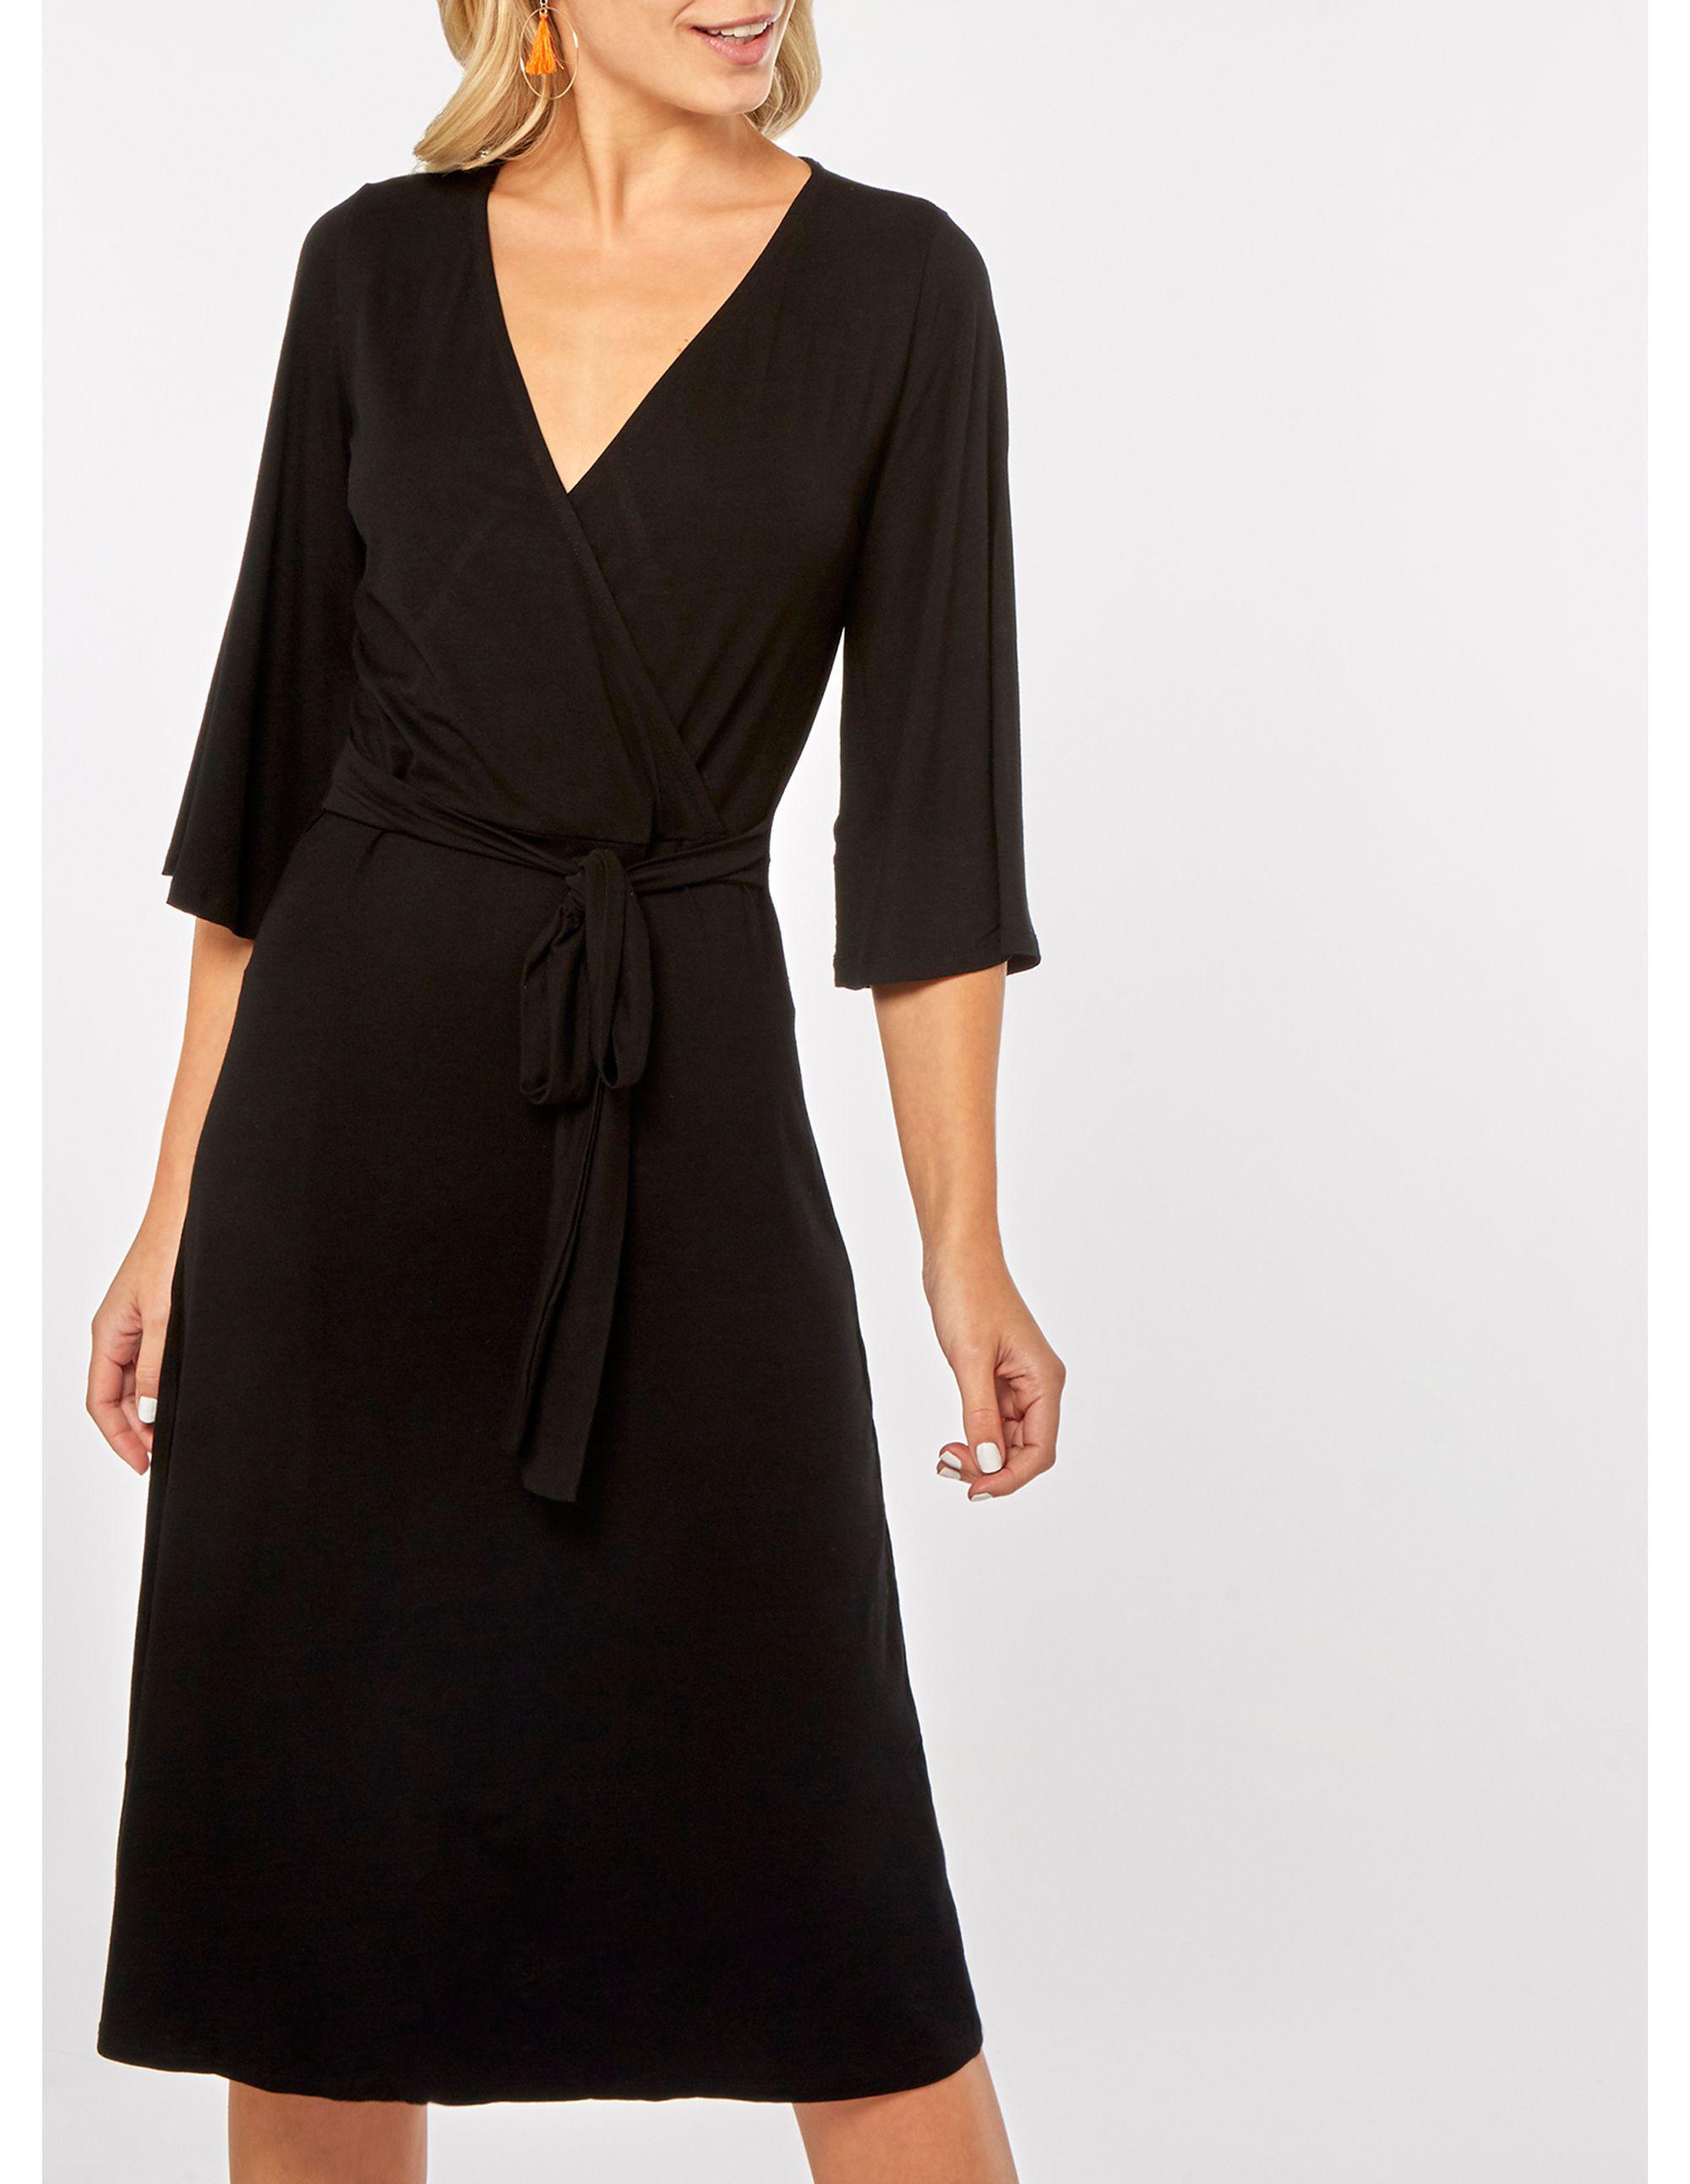 e00f726f9ff7 Dorothy Perkins Plain Black Midi Wrap Dress in Black - Lyst